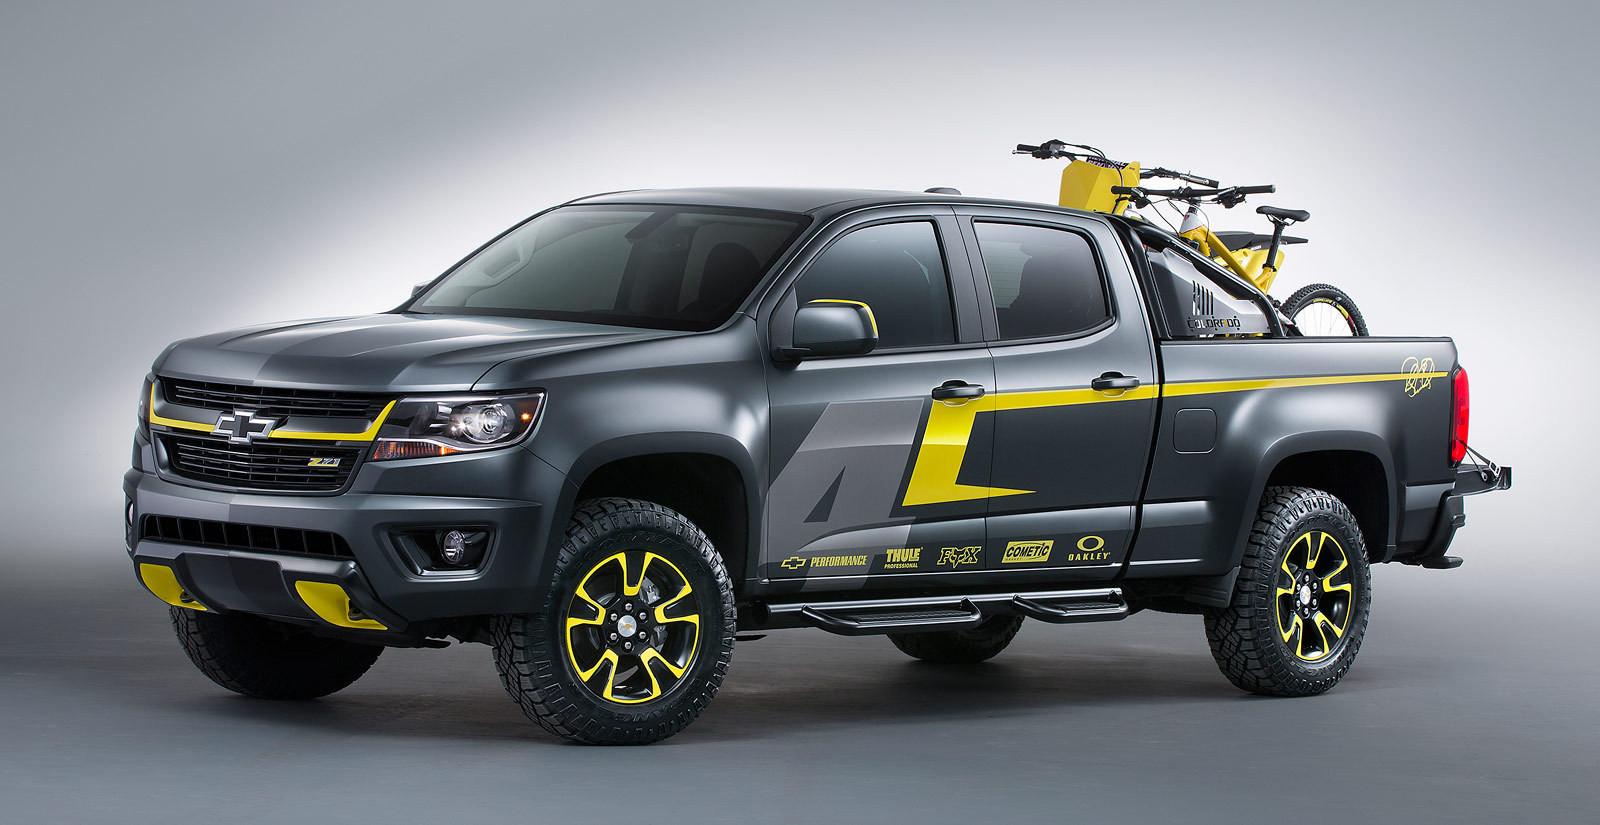 Truck chevy concept truck : Ricky Carmichael Chevy Performance SEMA Concept Truck - Motocross ...